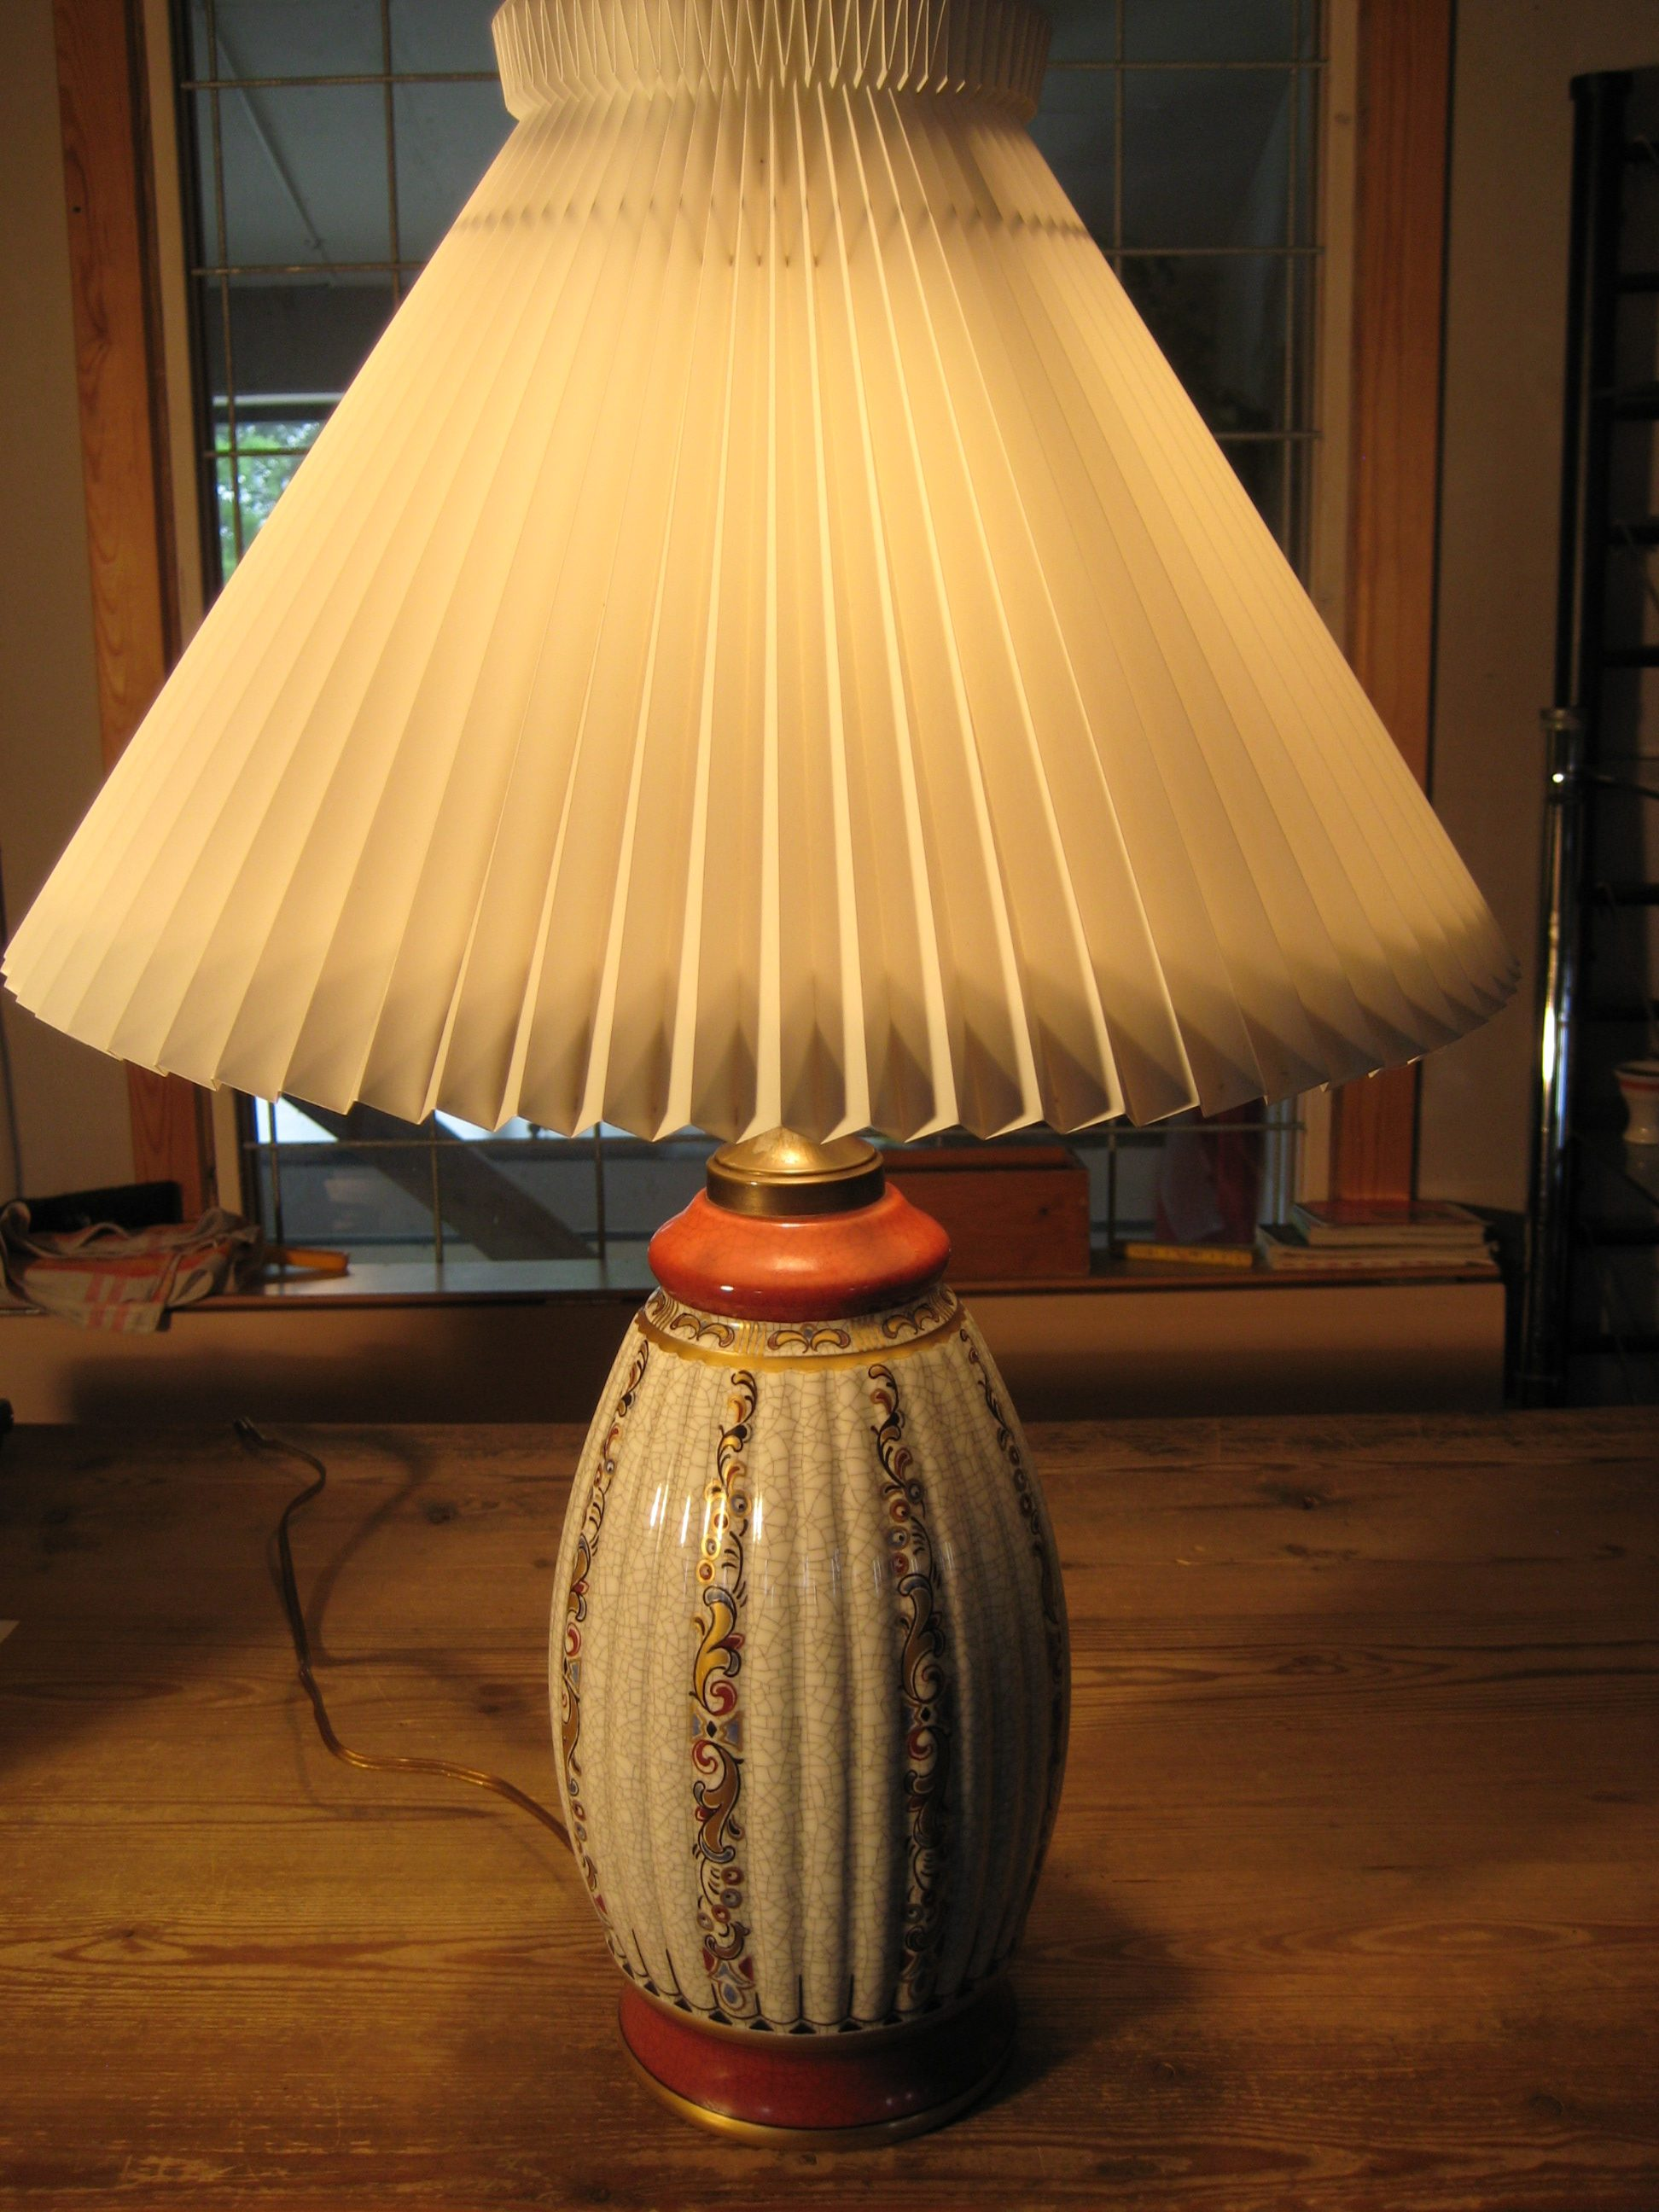 Dahl Jensen bordlampe